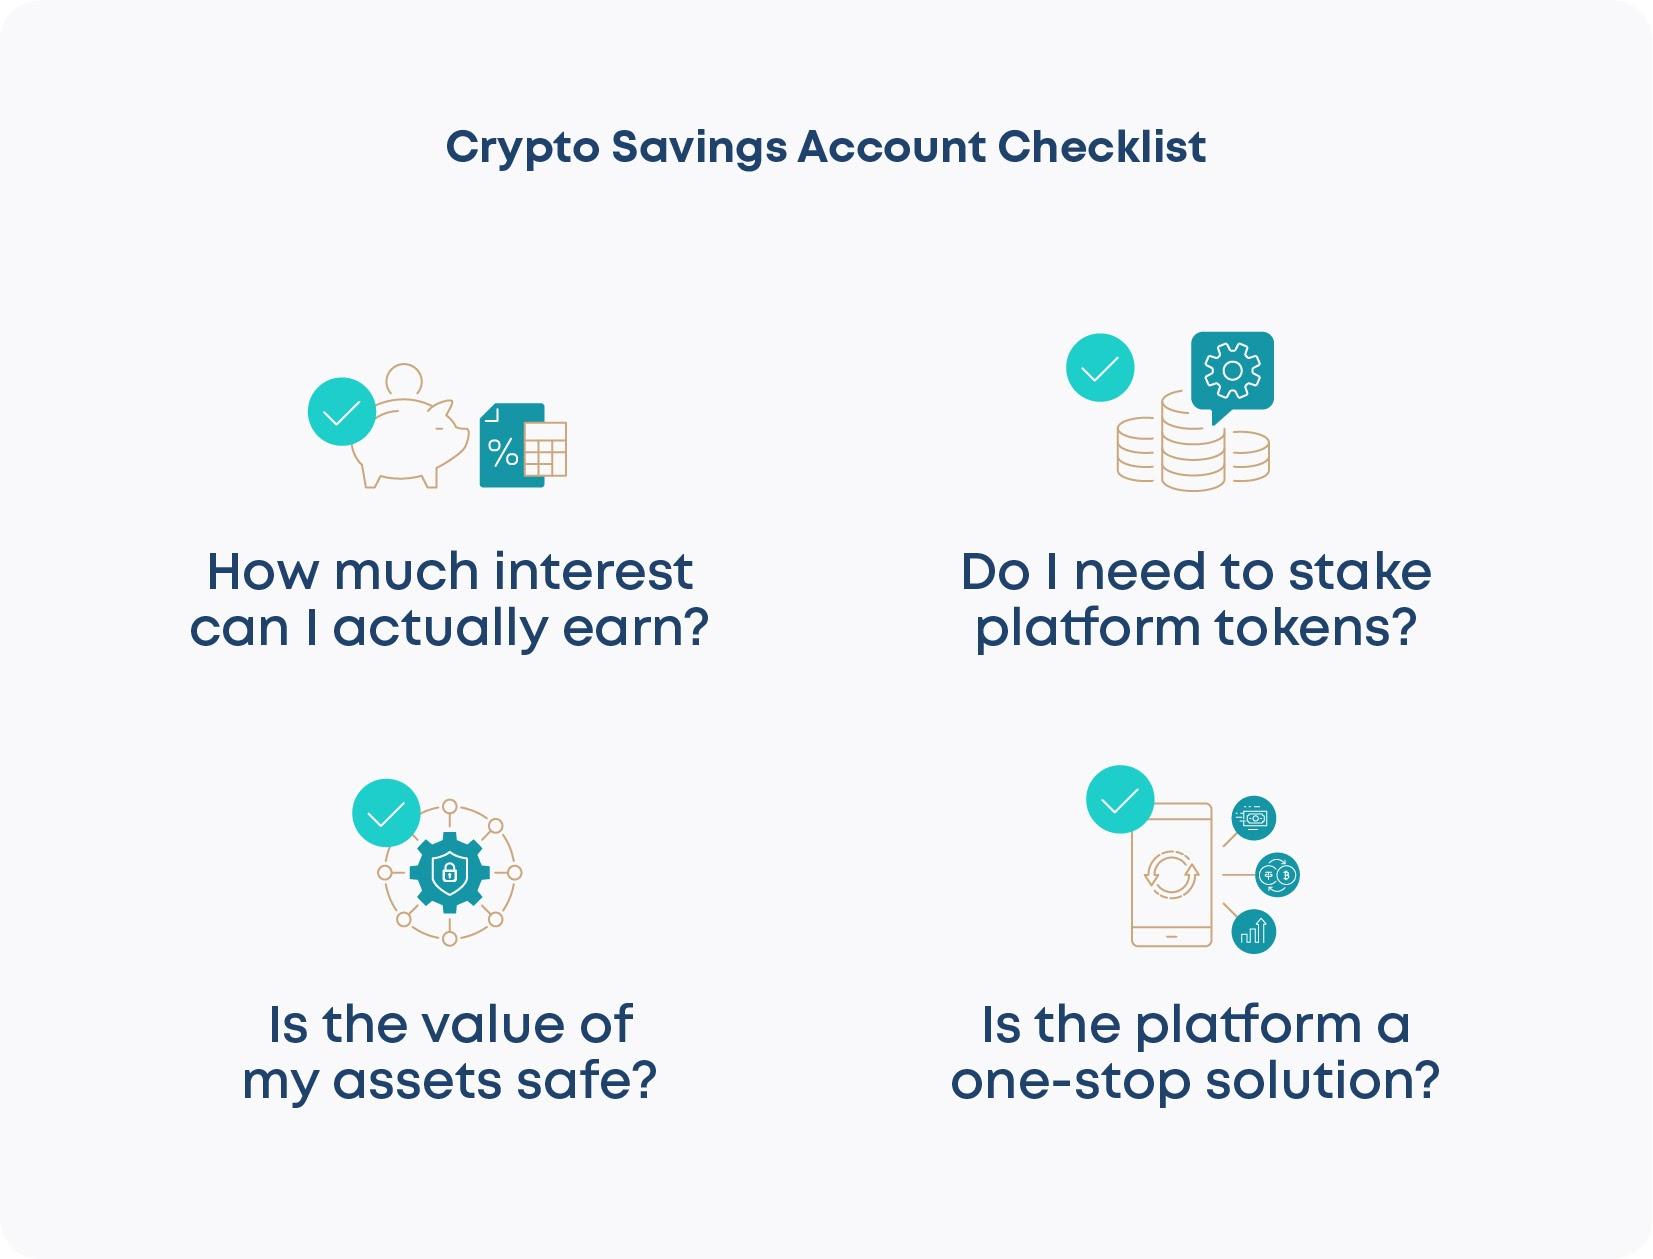 Crypto Savings Account Checklist